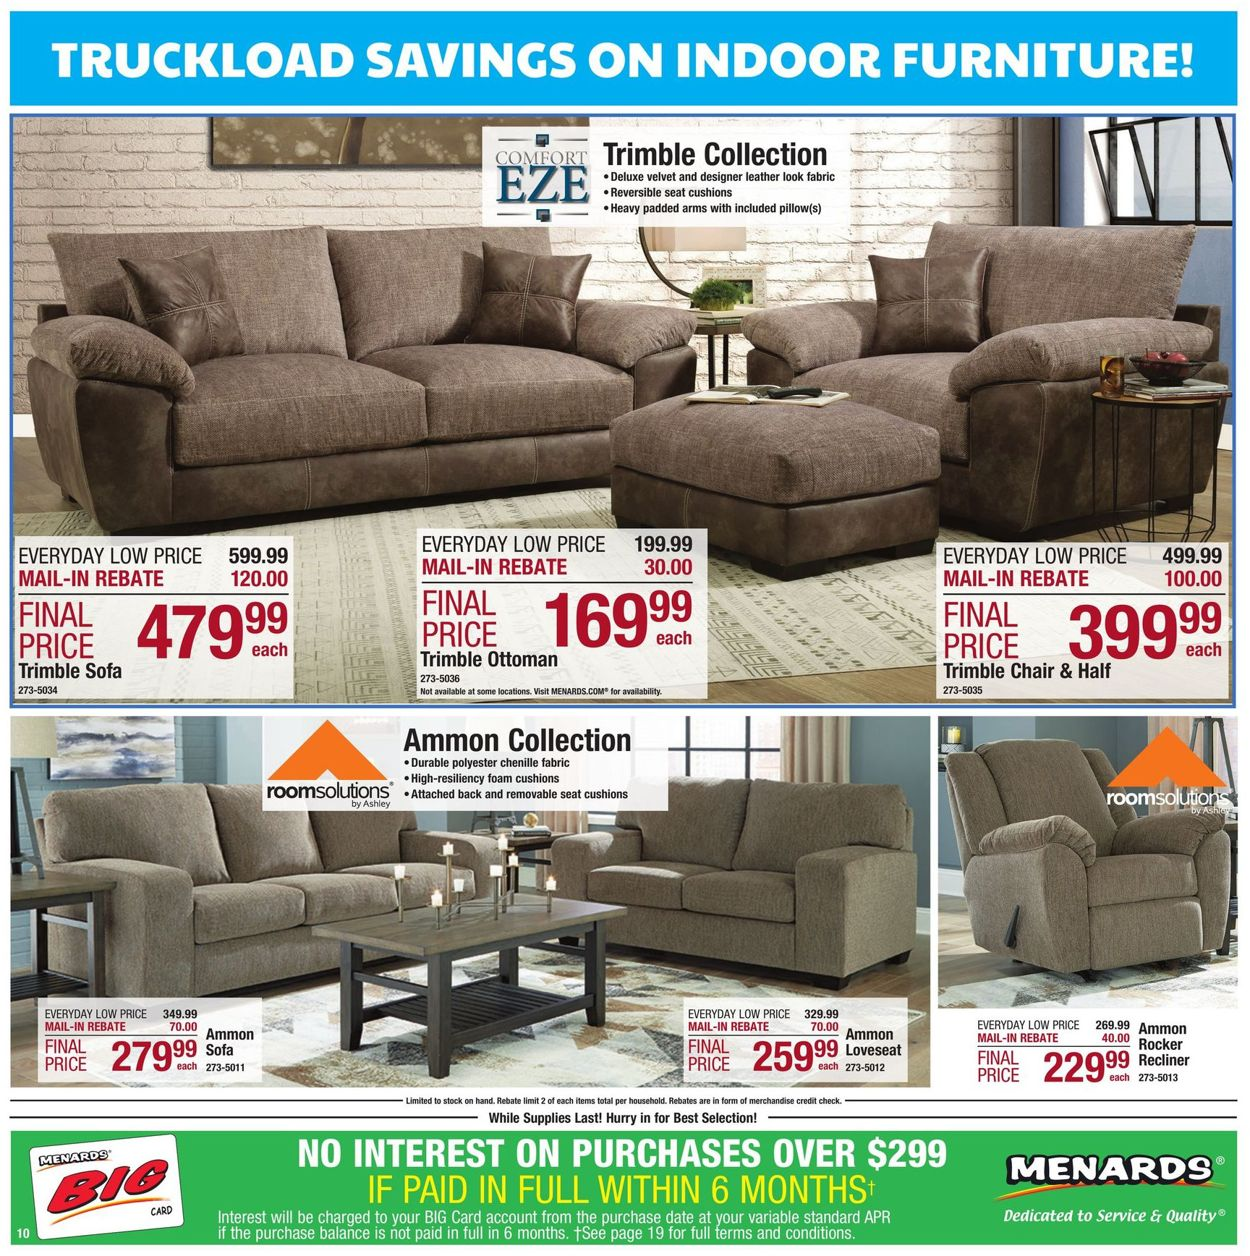 Menards Cur Weekly Ad 08 18 24, Menards Living Room Furniture